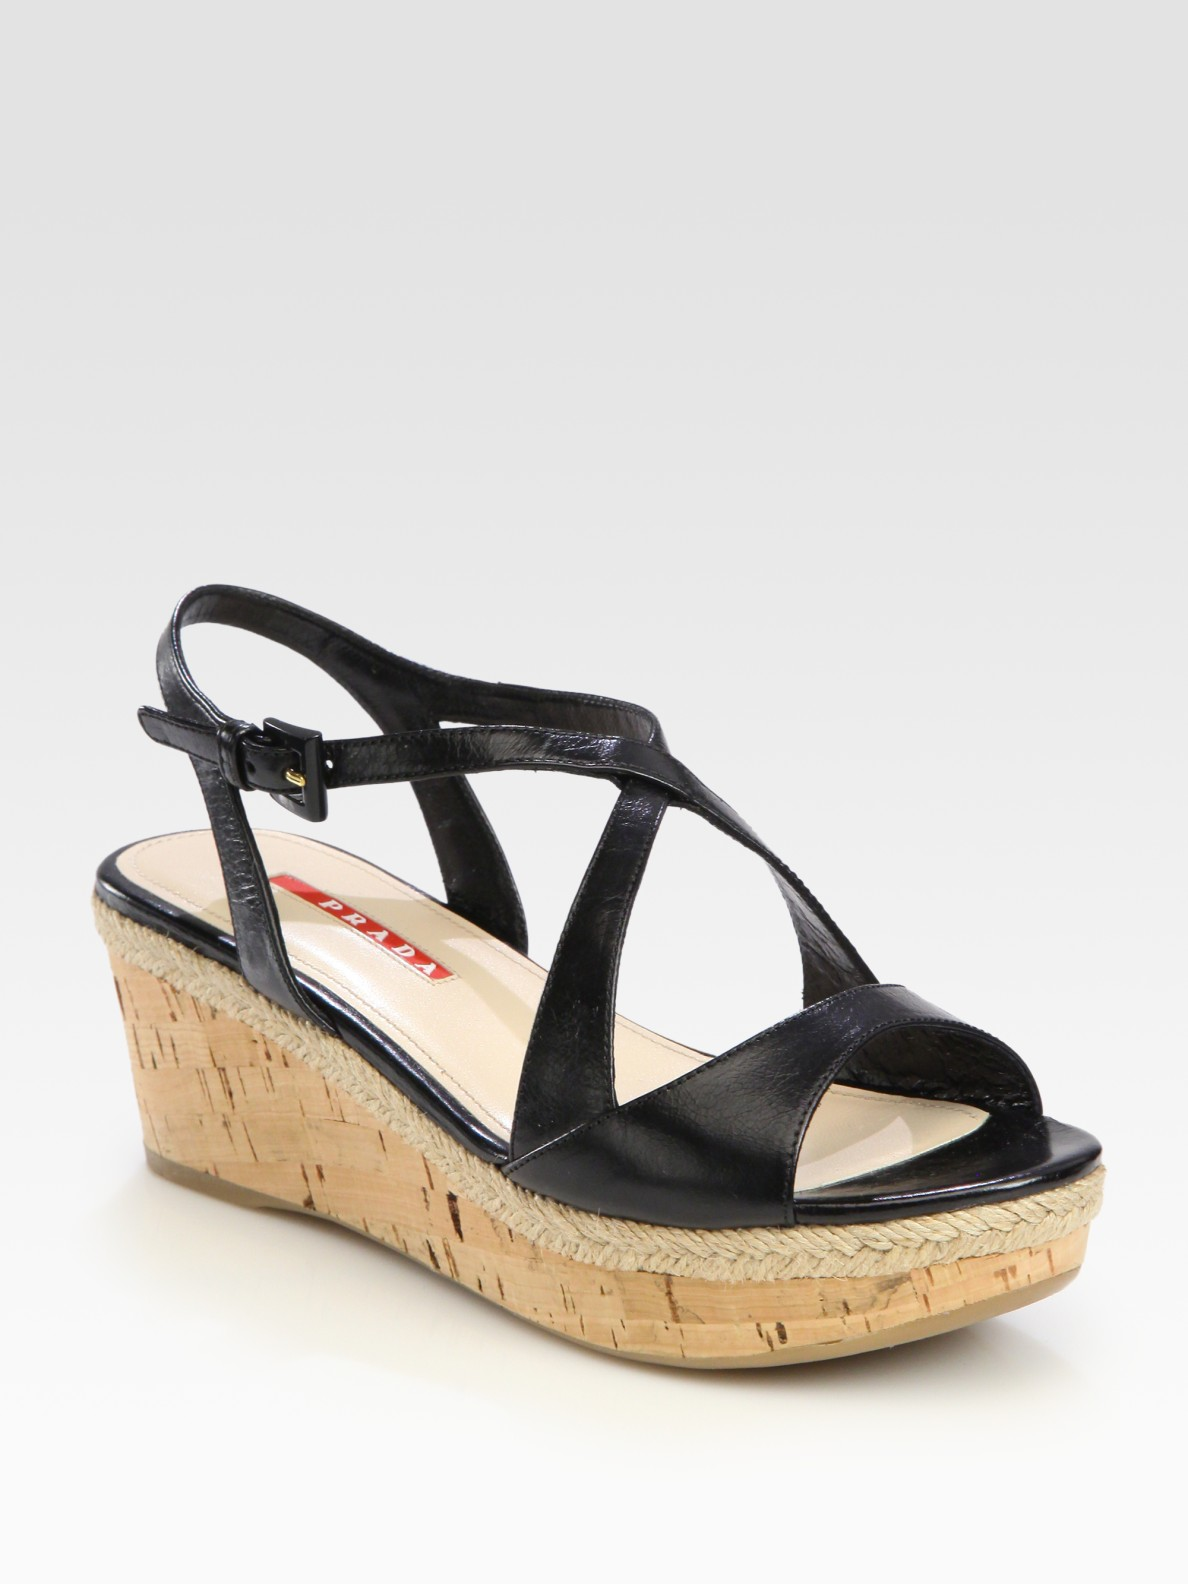 Prada Wedge Sandals In Black Lyst